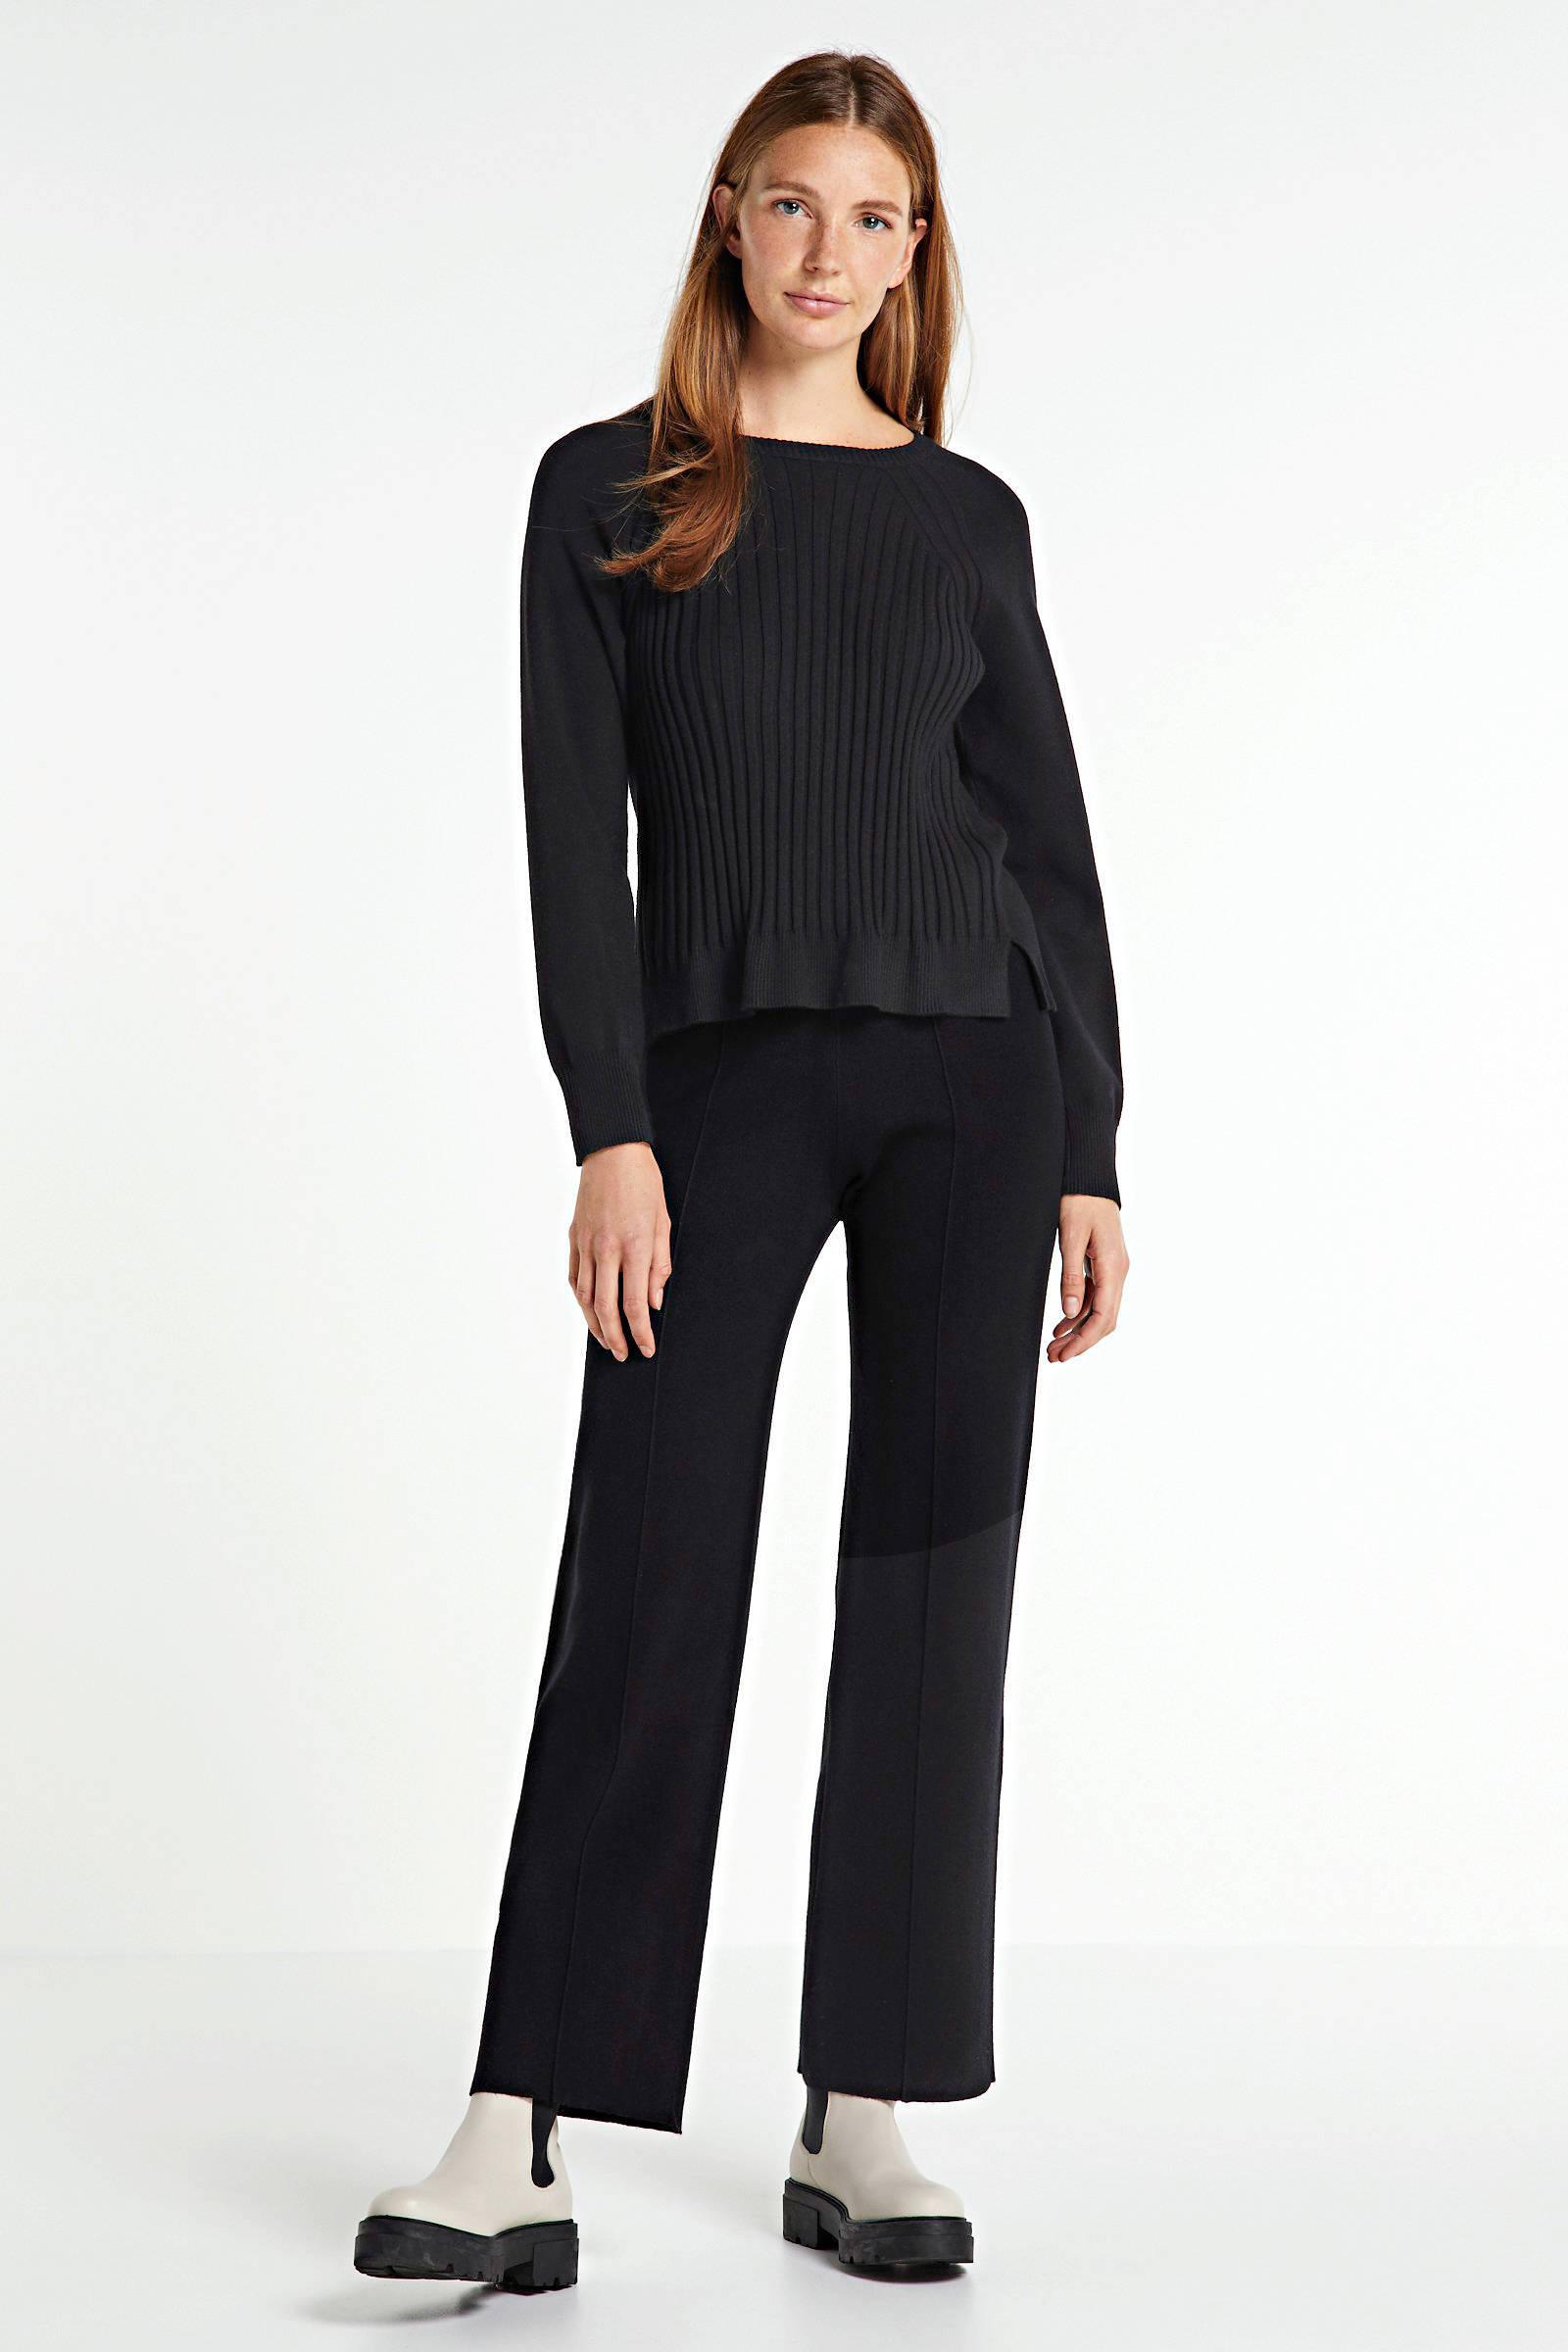 Soaked In Luxury trui zwart | wehkamp